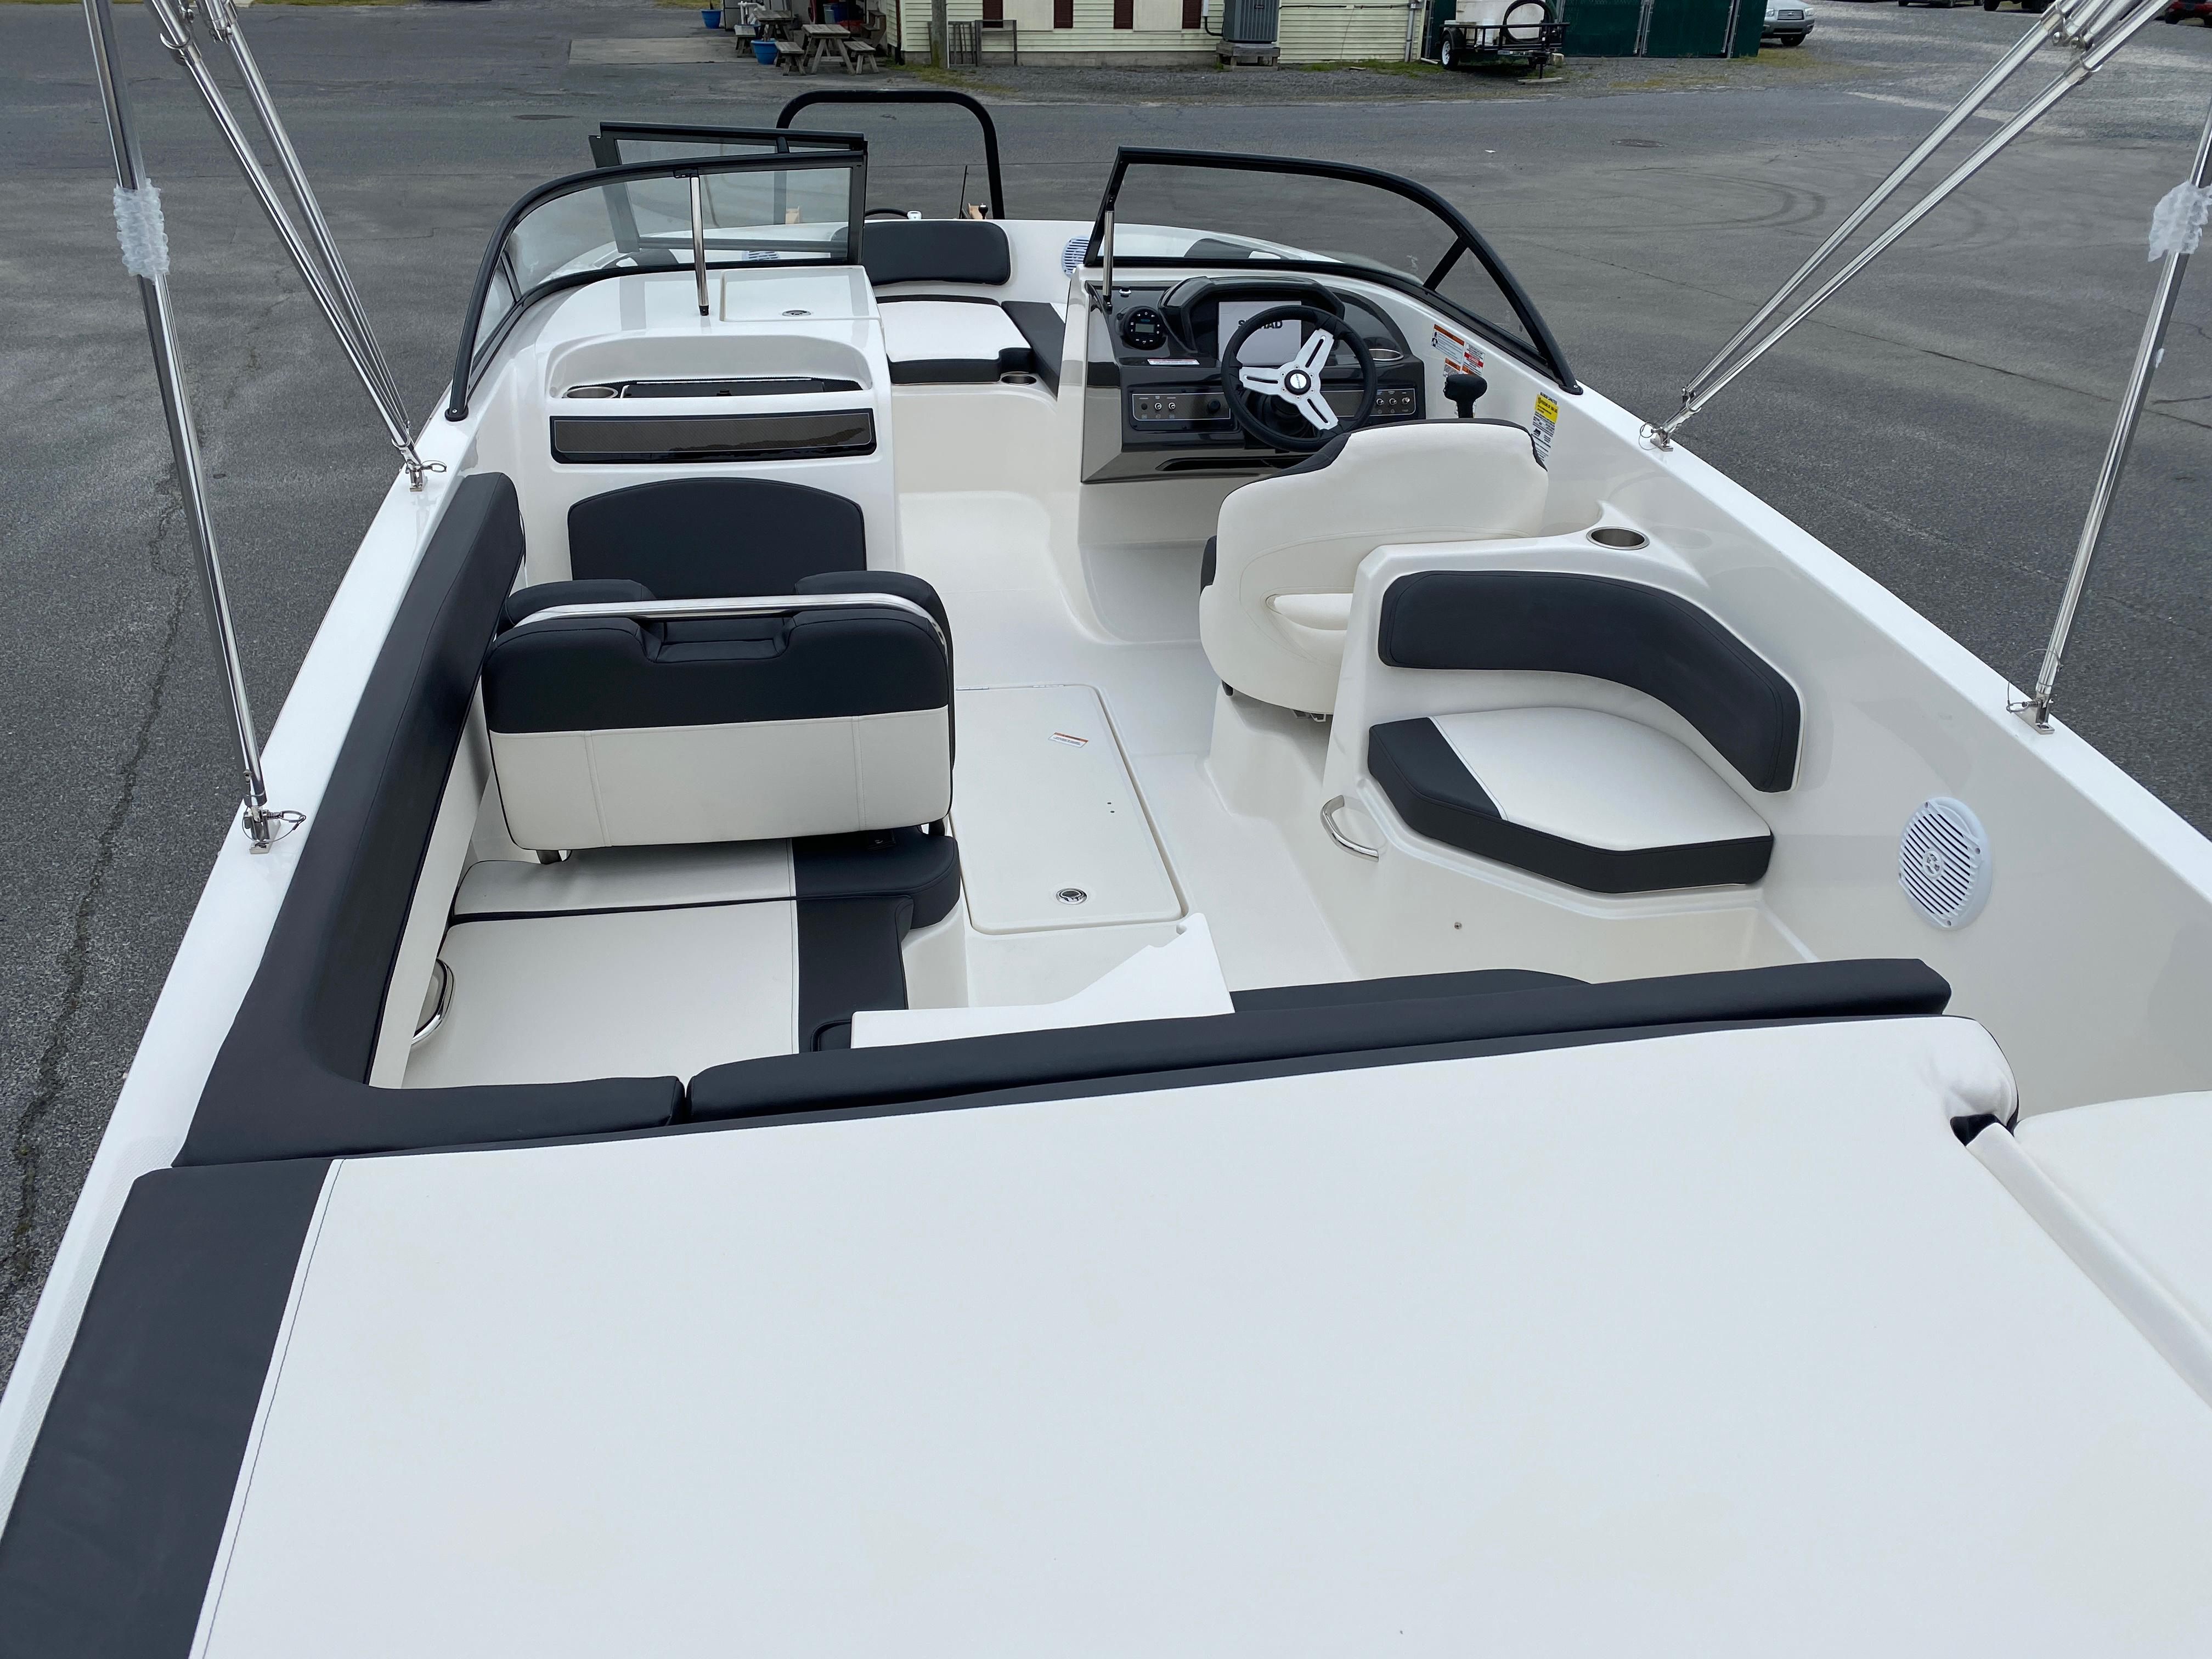 2020 Bayliner boat for sale, model of the boat is VR6 Bowrider & Image # 4 of 14